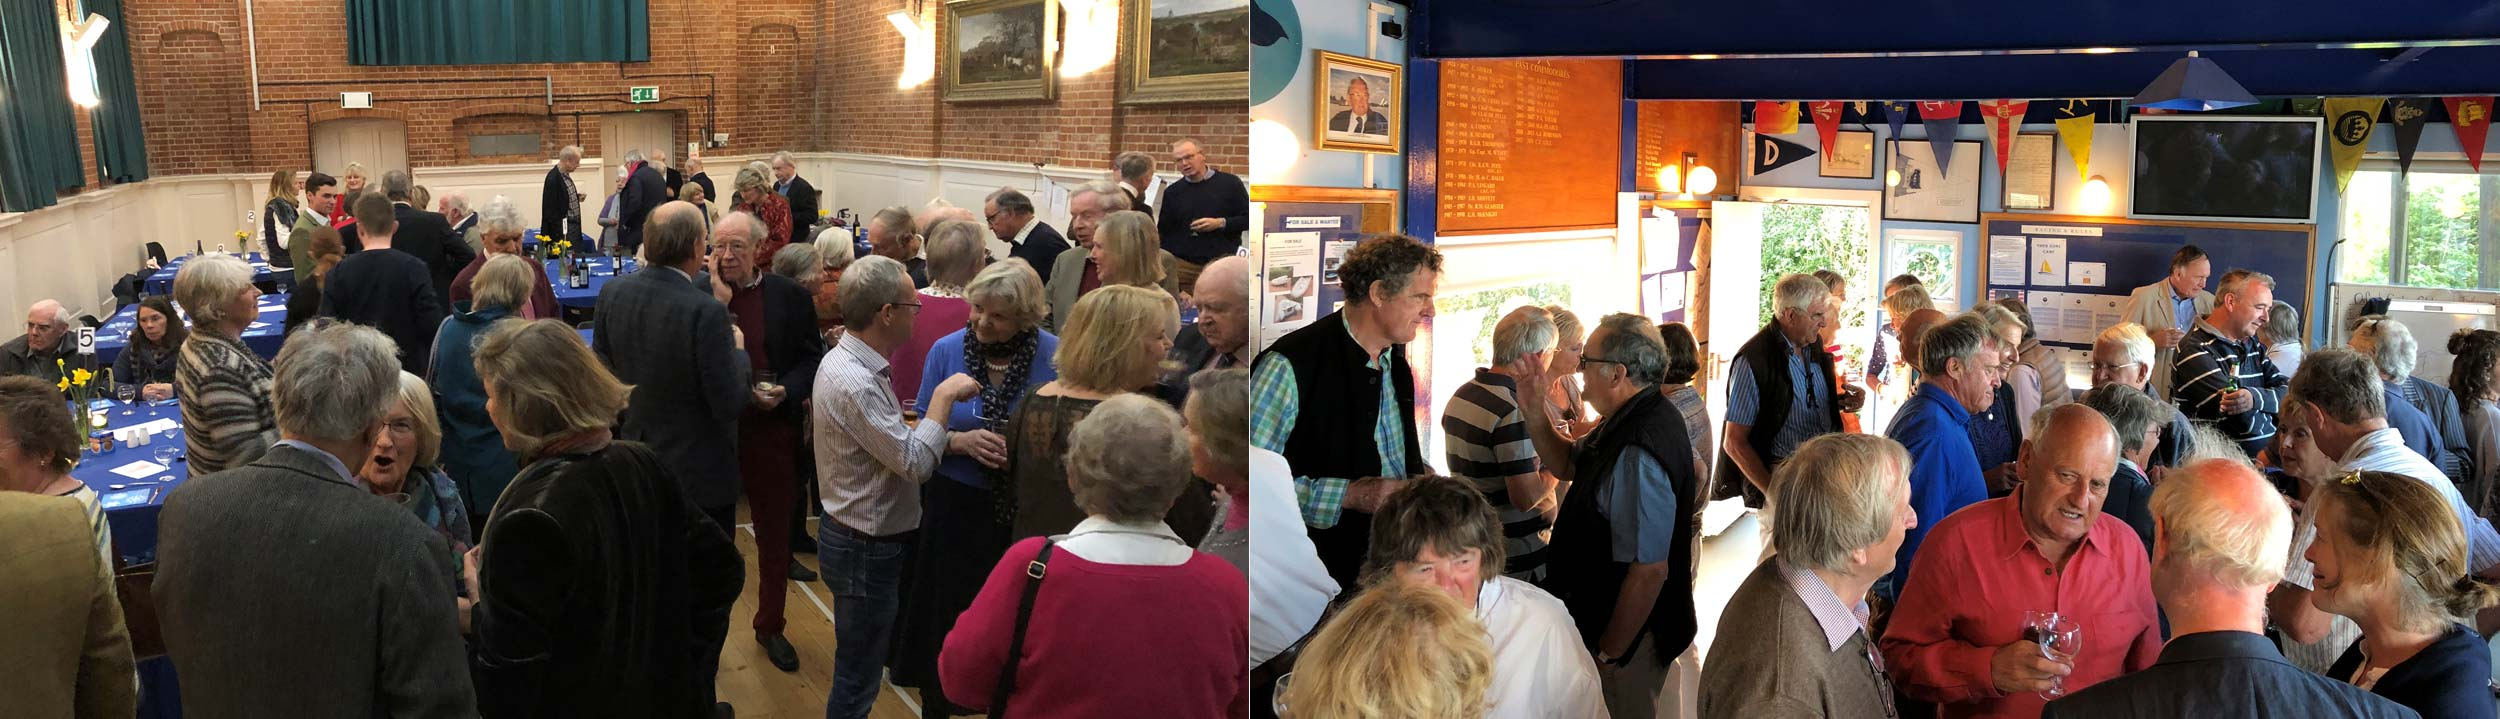 Orford Sailing Club - Social Events